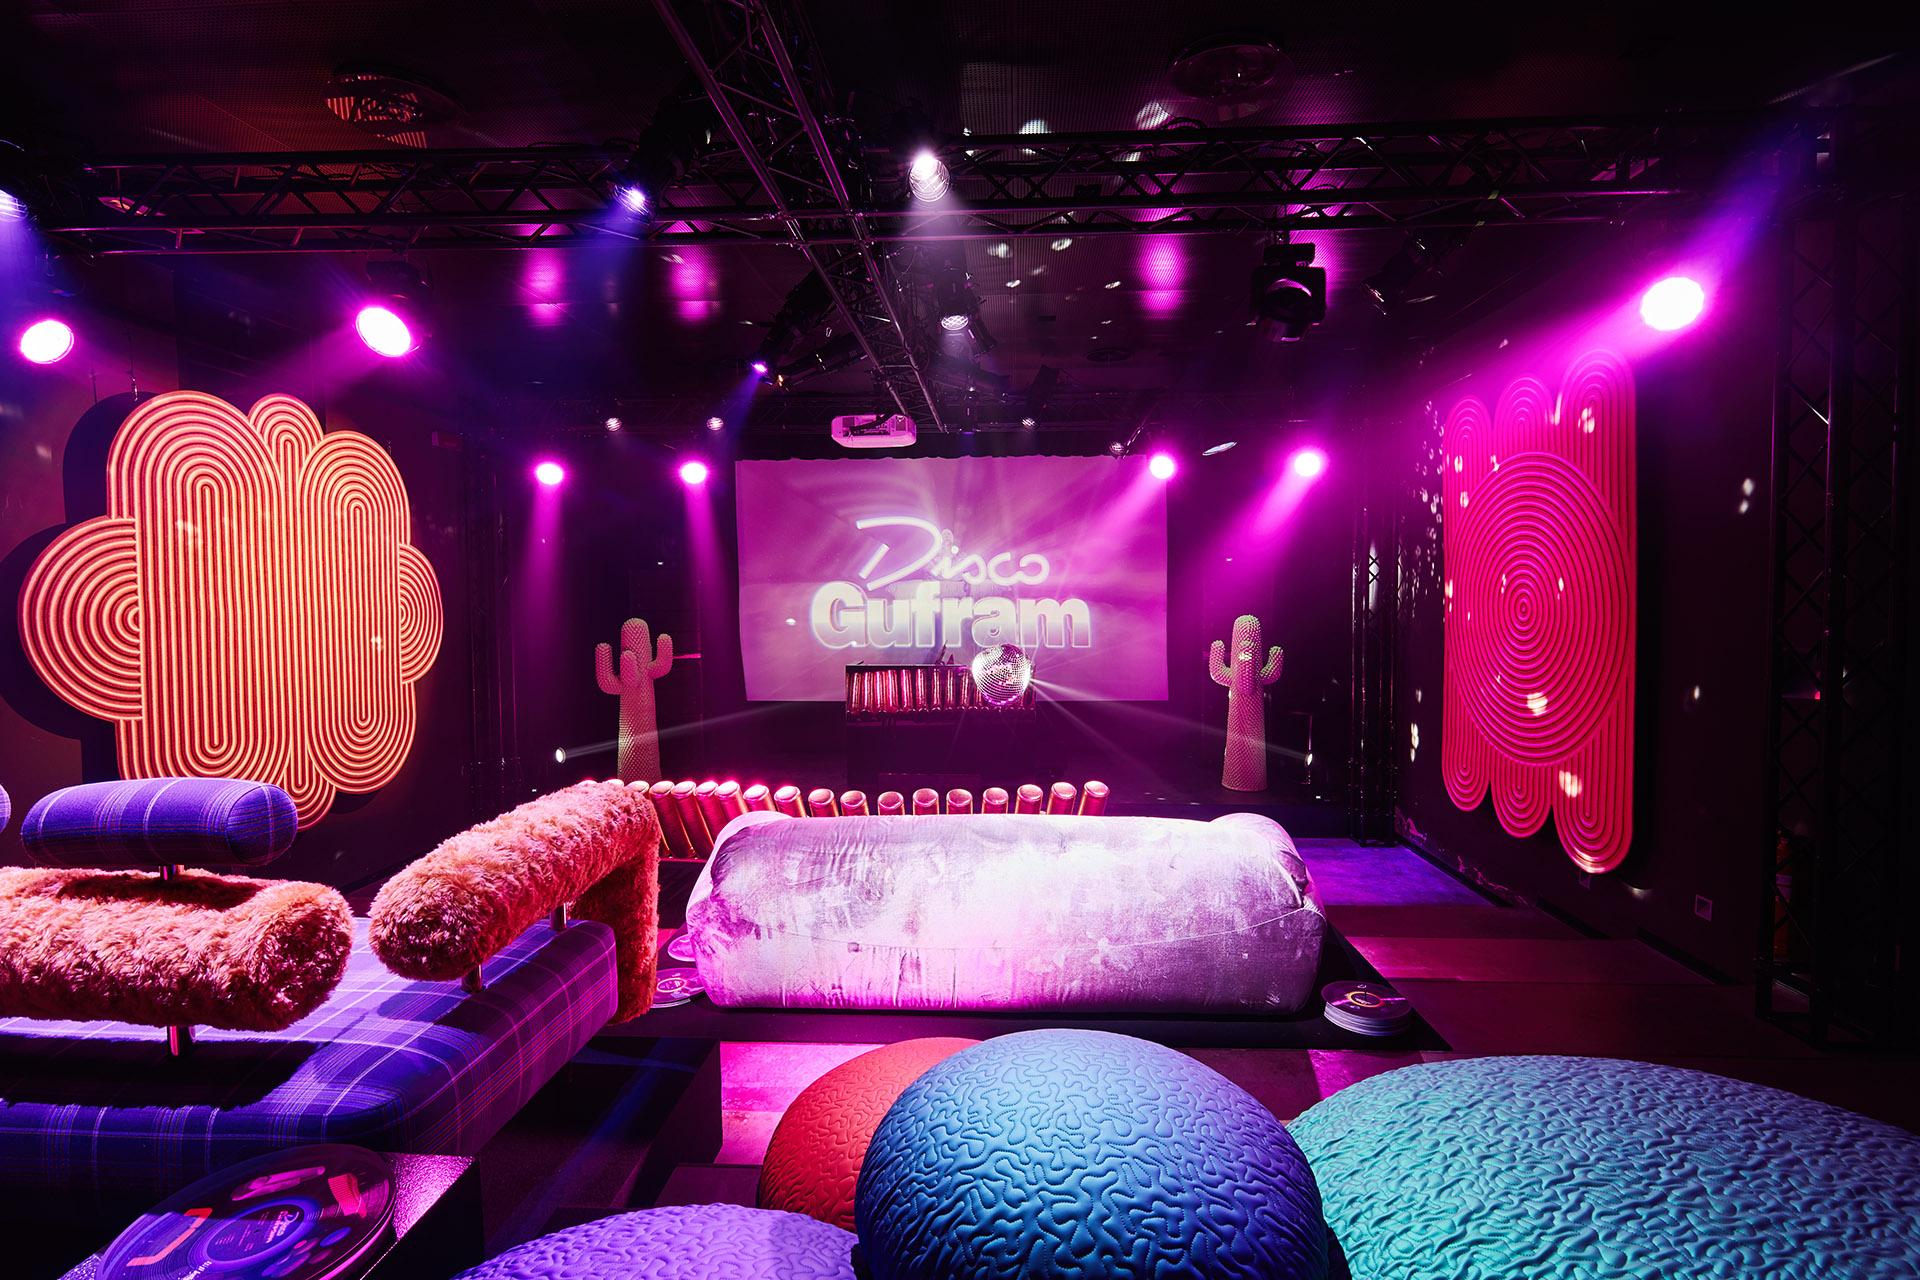 Gufram unisce la club culture al design con Disco Gufram | Collater.al 12